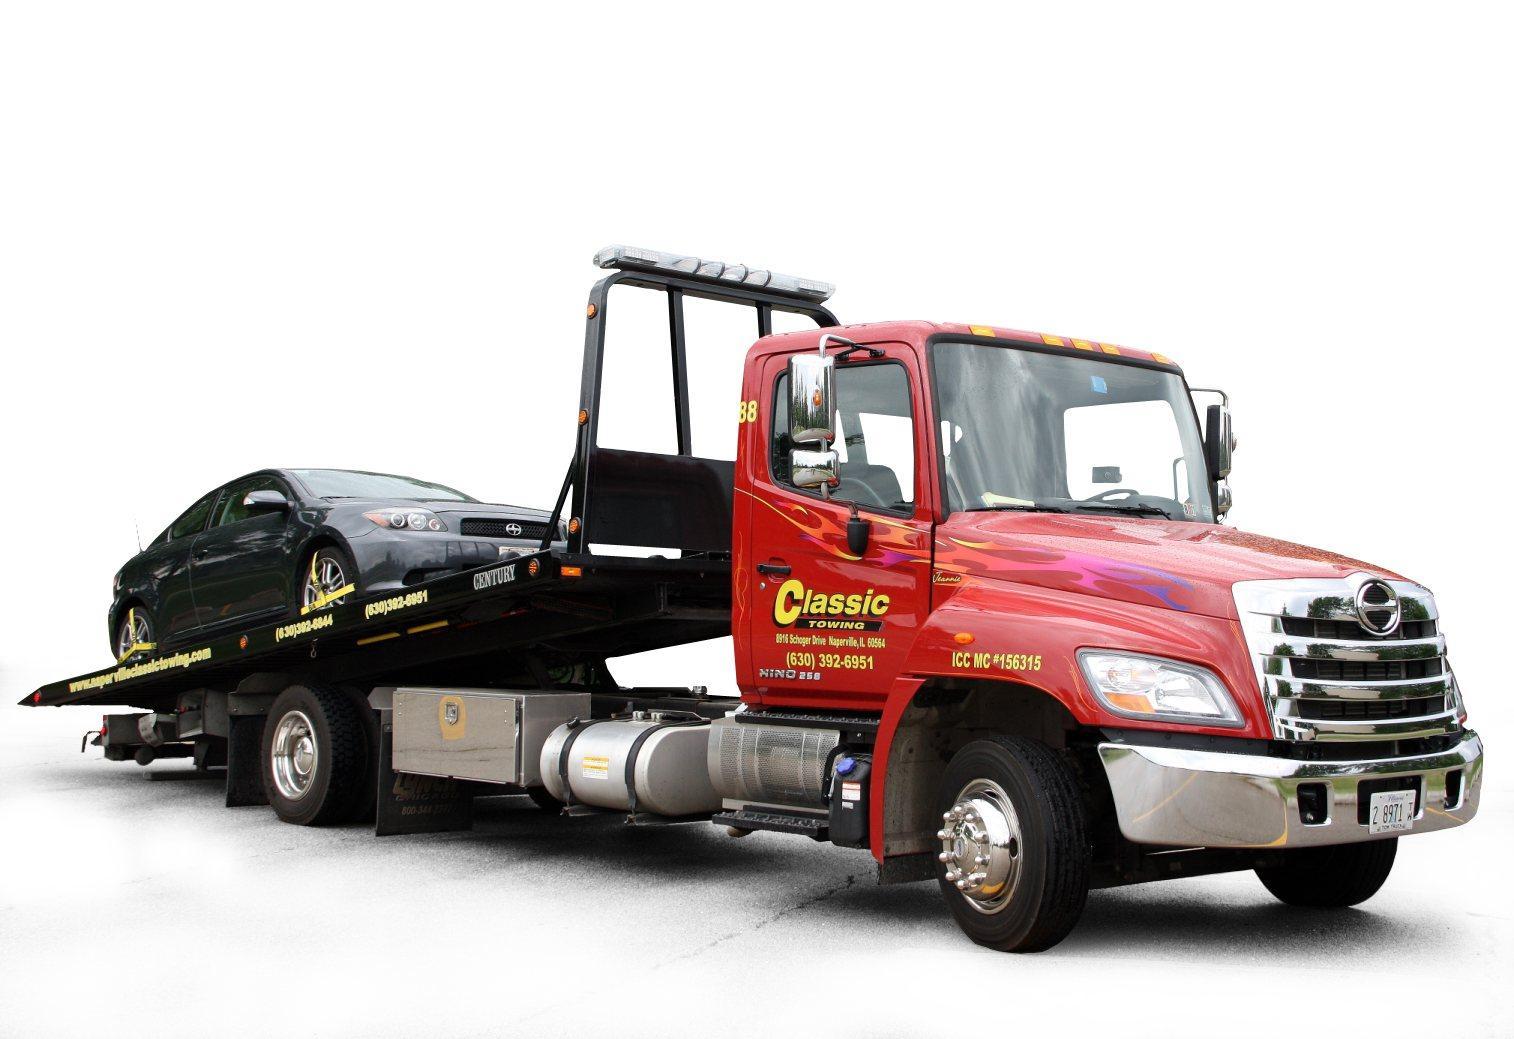 quincy automotive roadside service